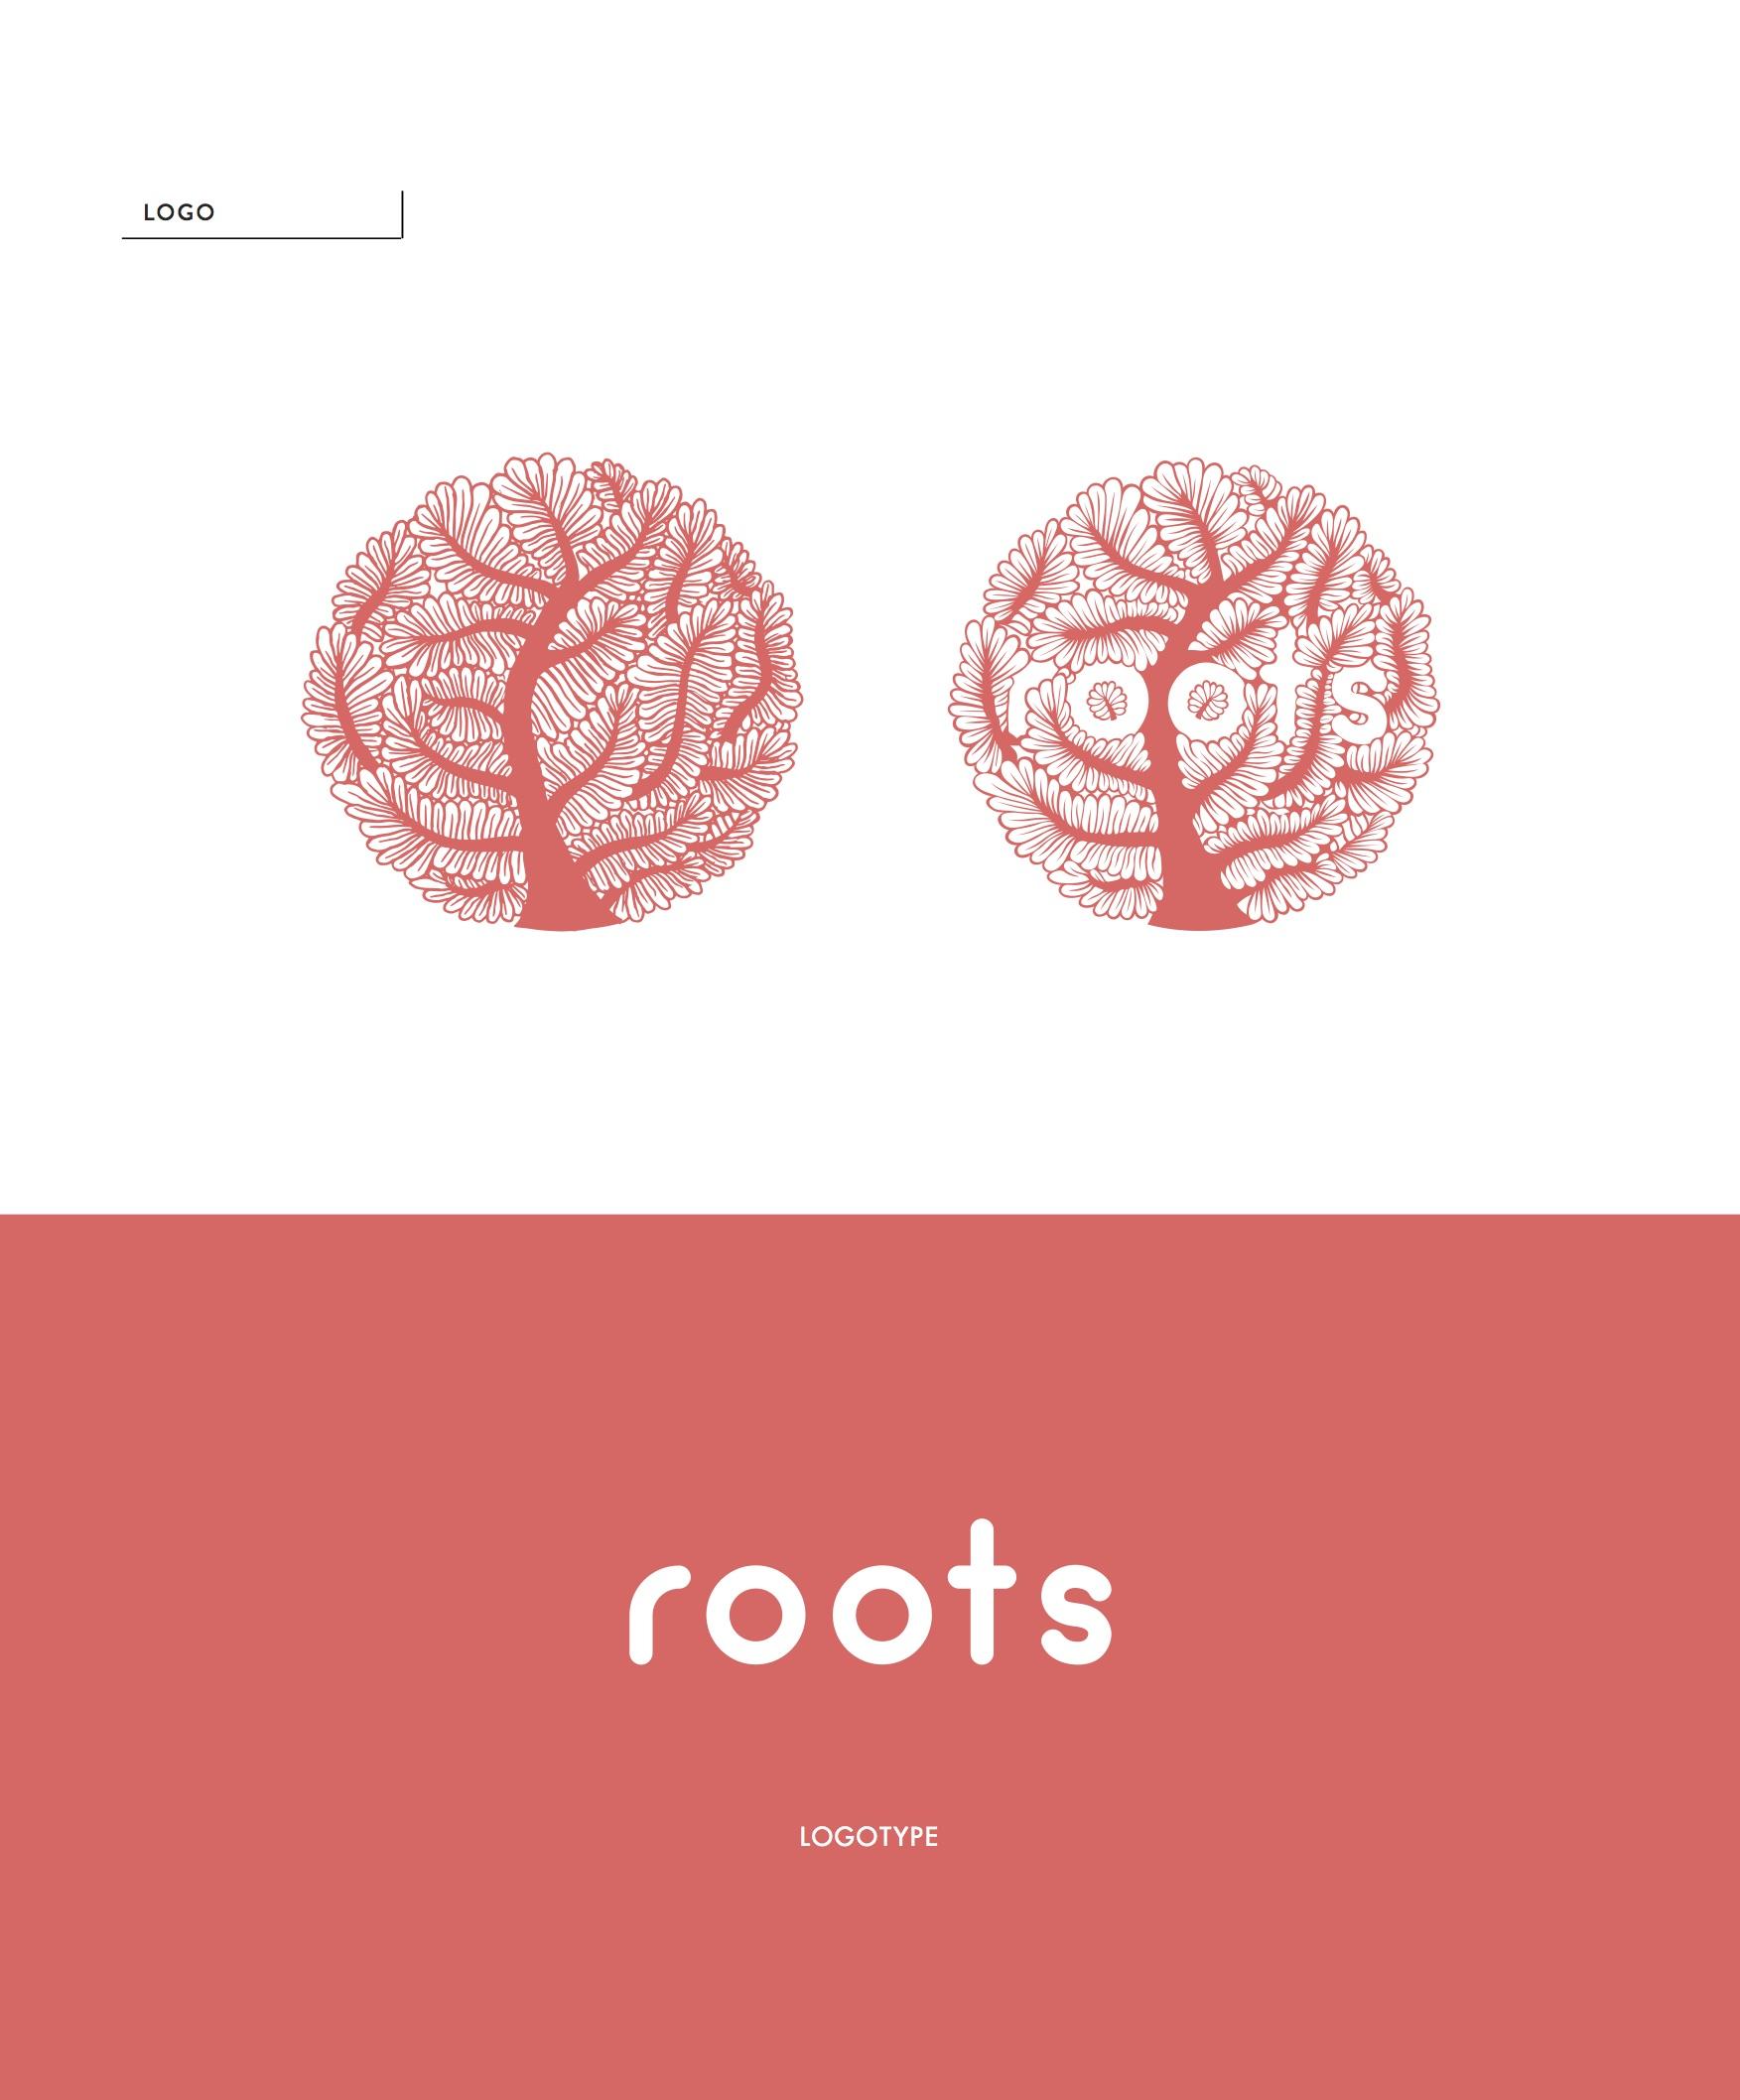 ROOTS-JK 9Oct White LR.jpg